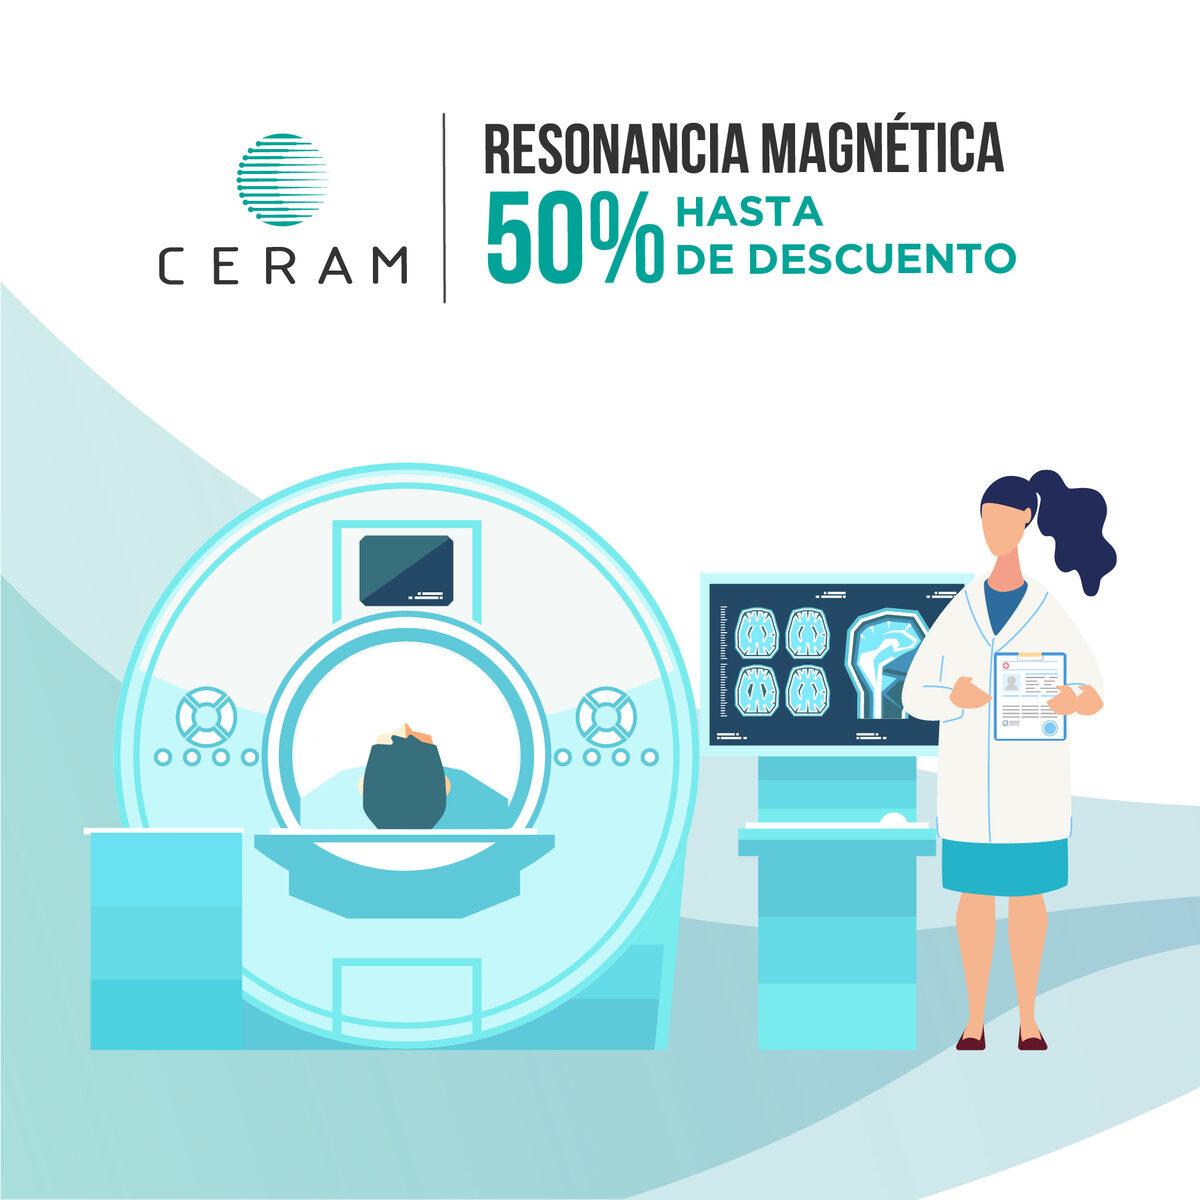 Portafolio-FullFrame-Photomkt-Ceram-Ads-Facebook (2)